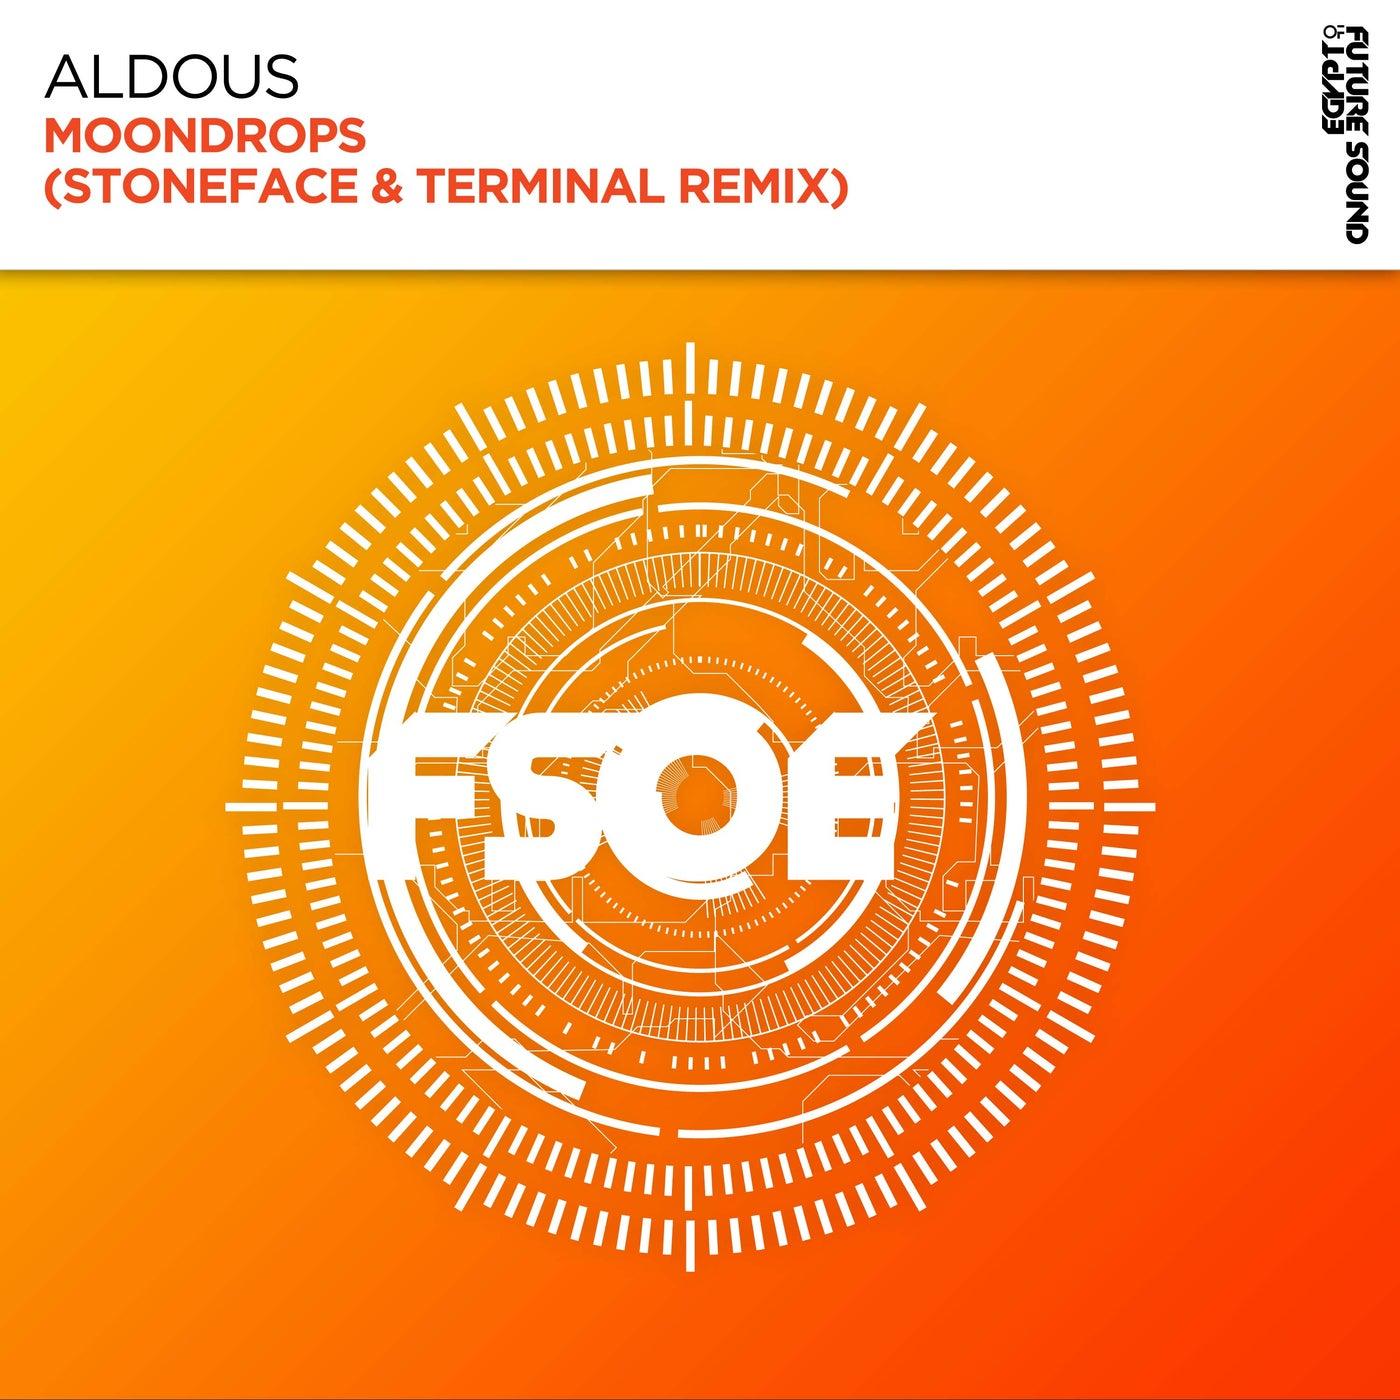 Moondrops (Stoneface & Terminal Extended Remix)